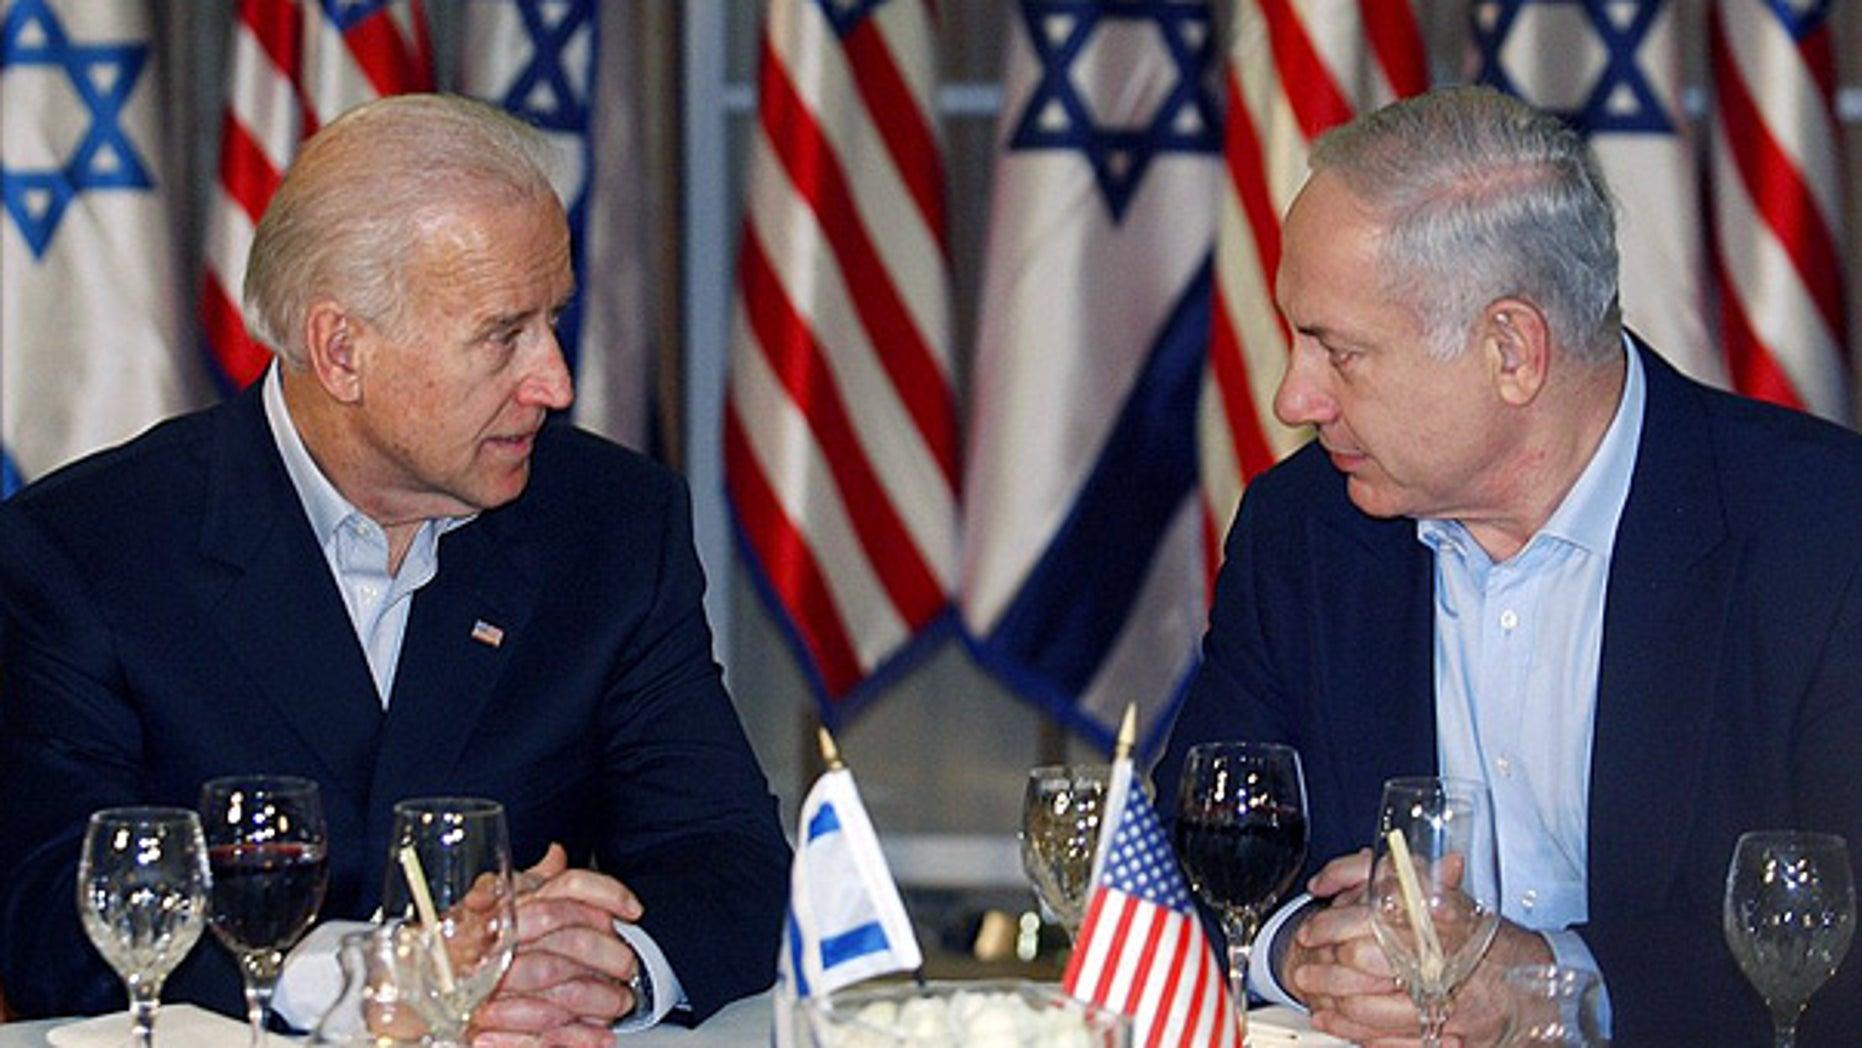 Mar. 9: Vice President Joe Biden sits with Israeli Prime Minister Benjamin Netanyahu before a dinner in Jerusalem.